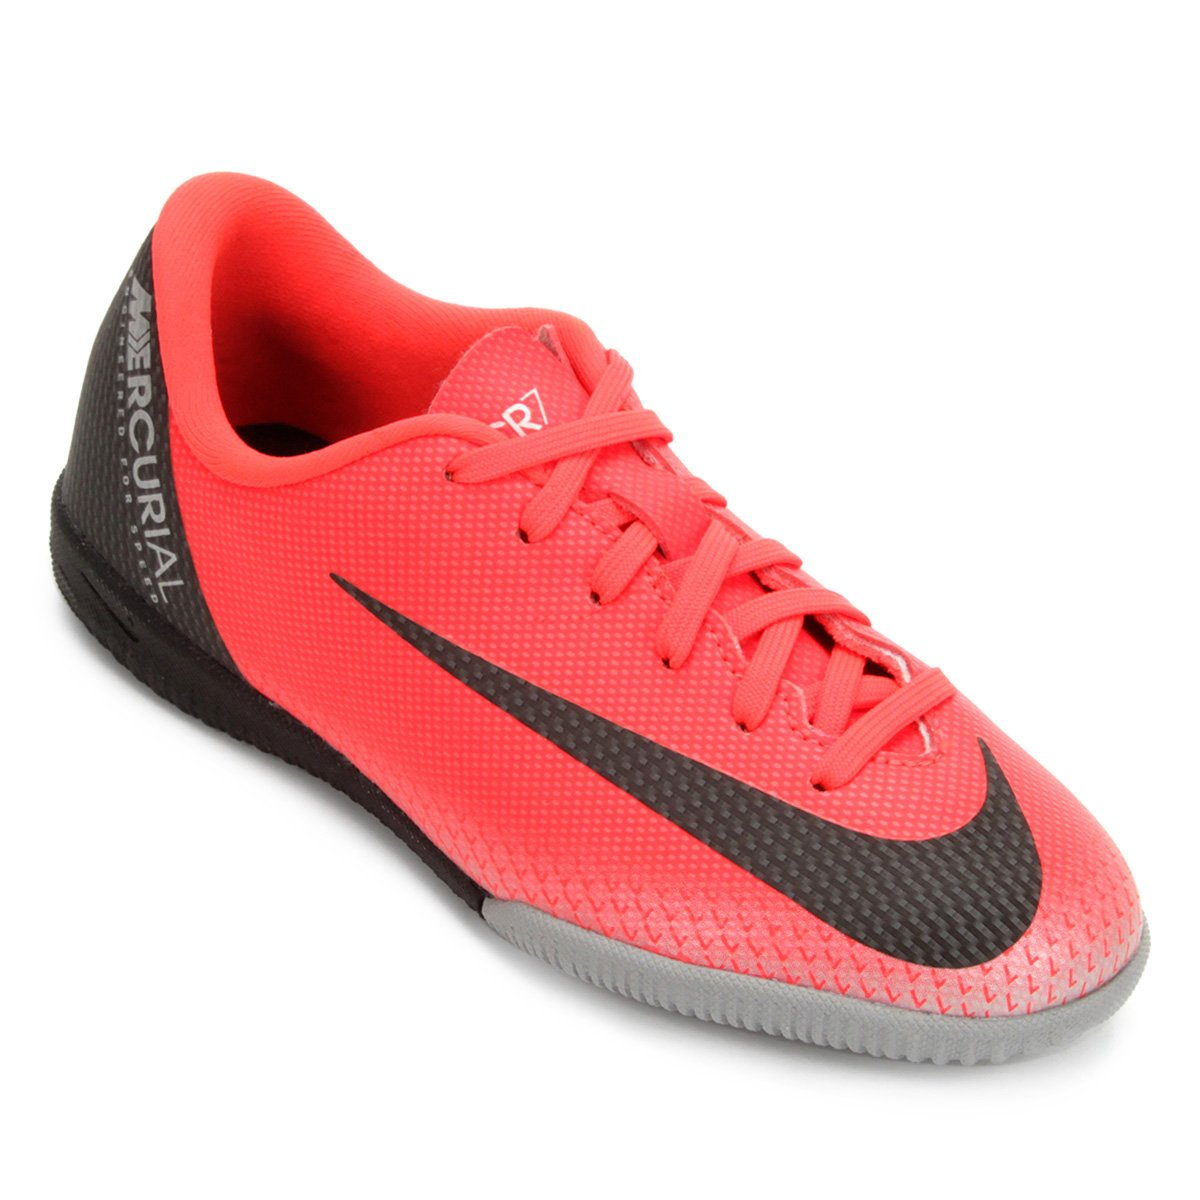 71424e8b2b Chuteira Futsal Infantil Nike Vapor 12 Academy GS CR7 IC - Vermelho ...